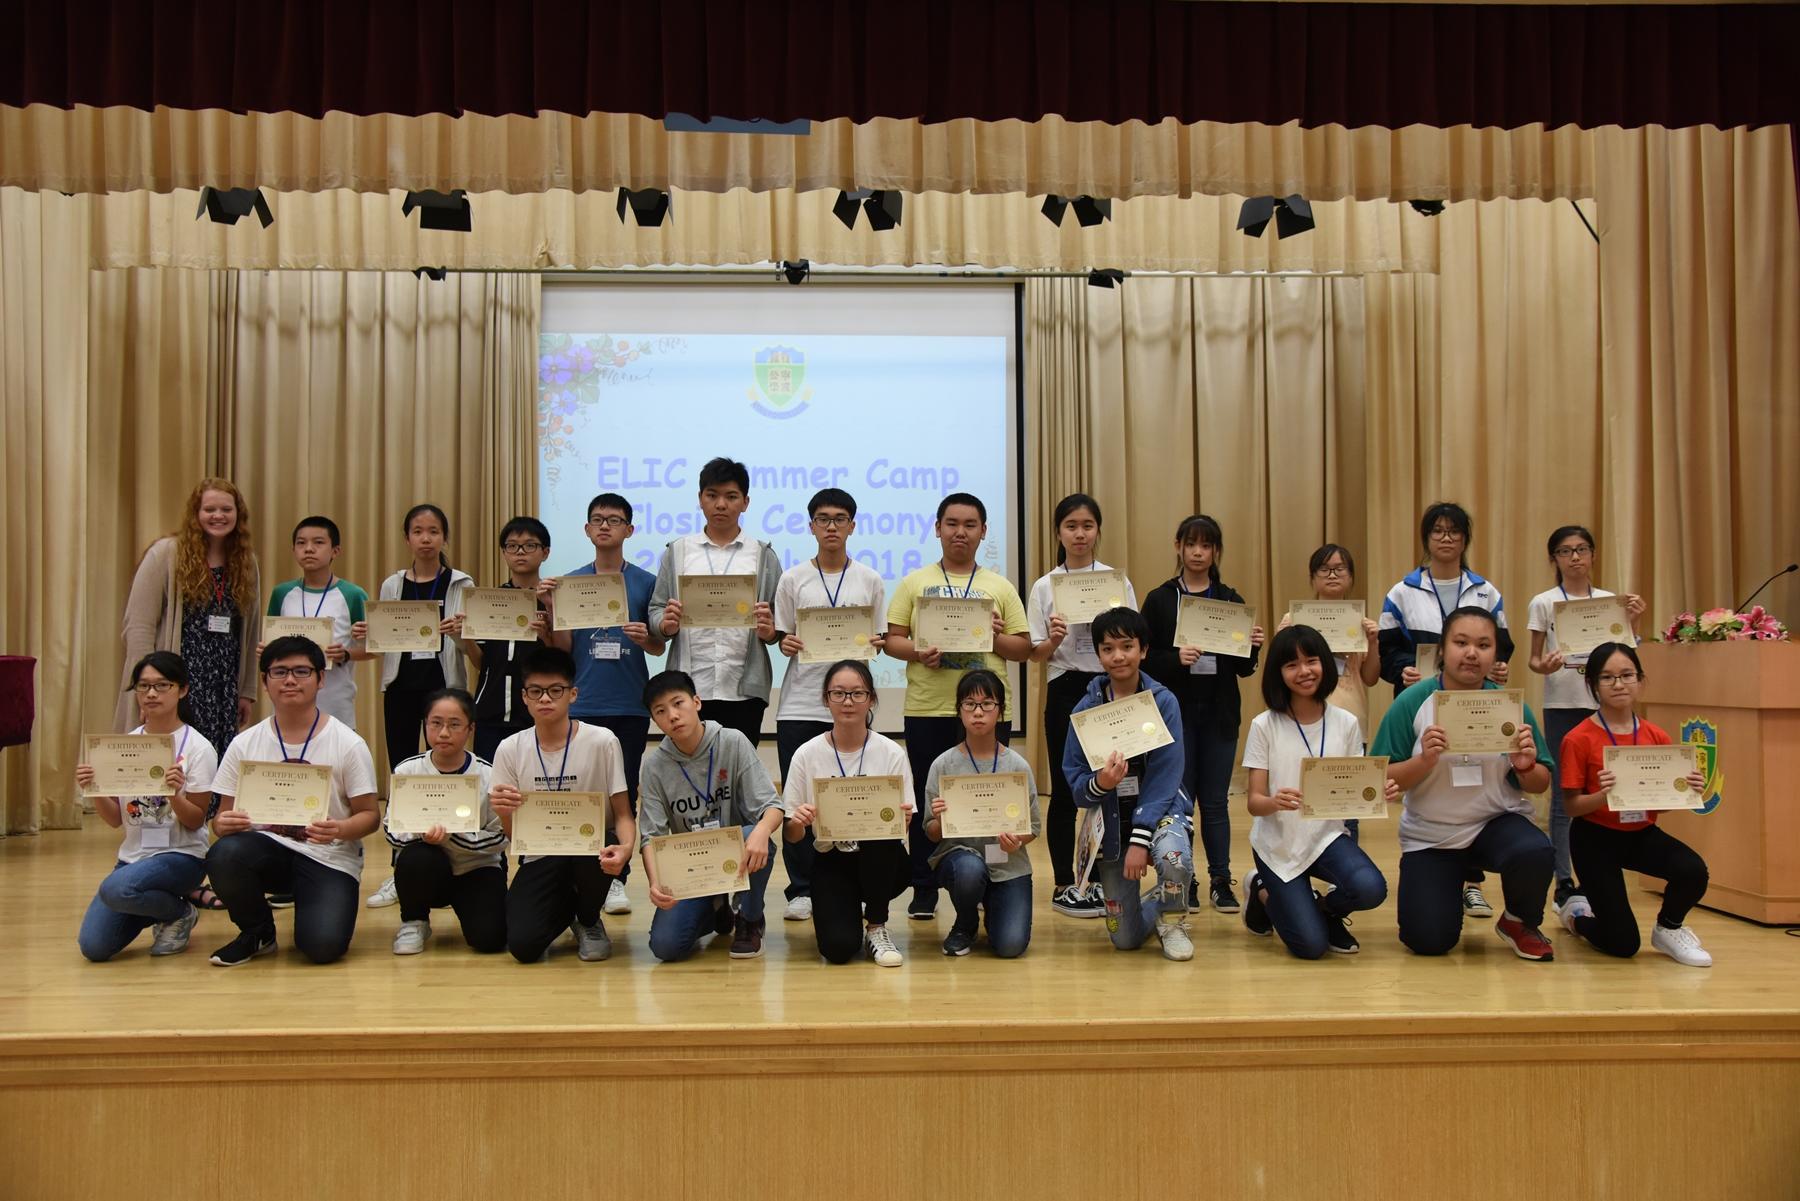 http://npc.edu.hk/sites/default/files/dsc_4741.jpg